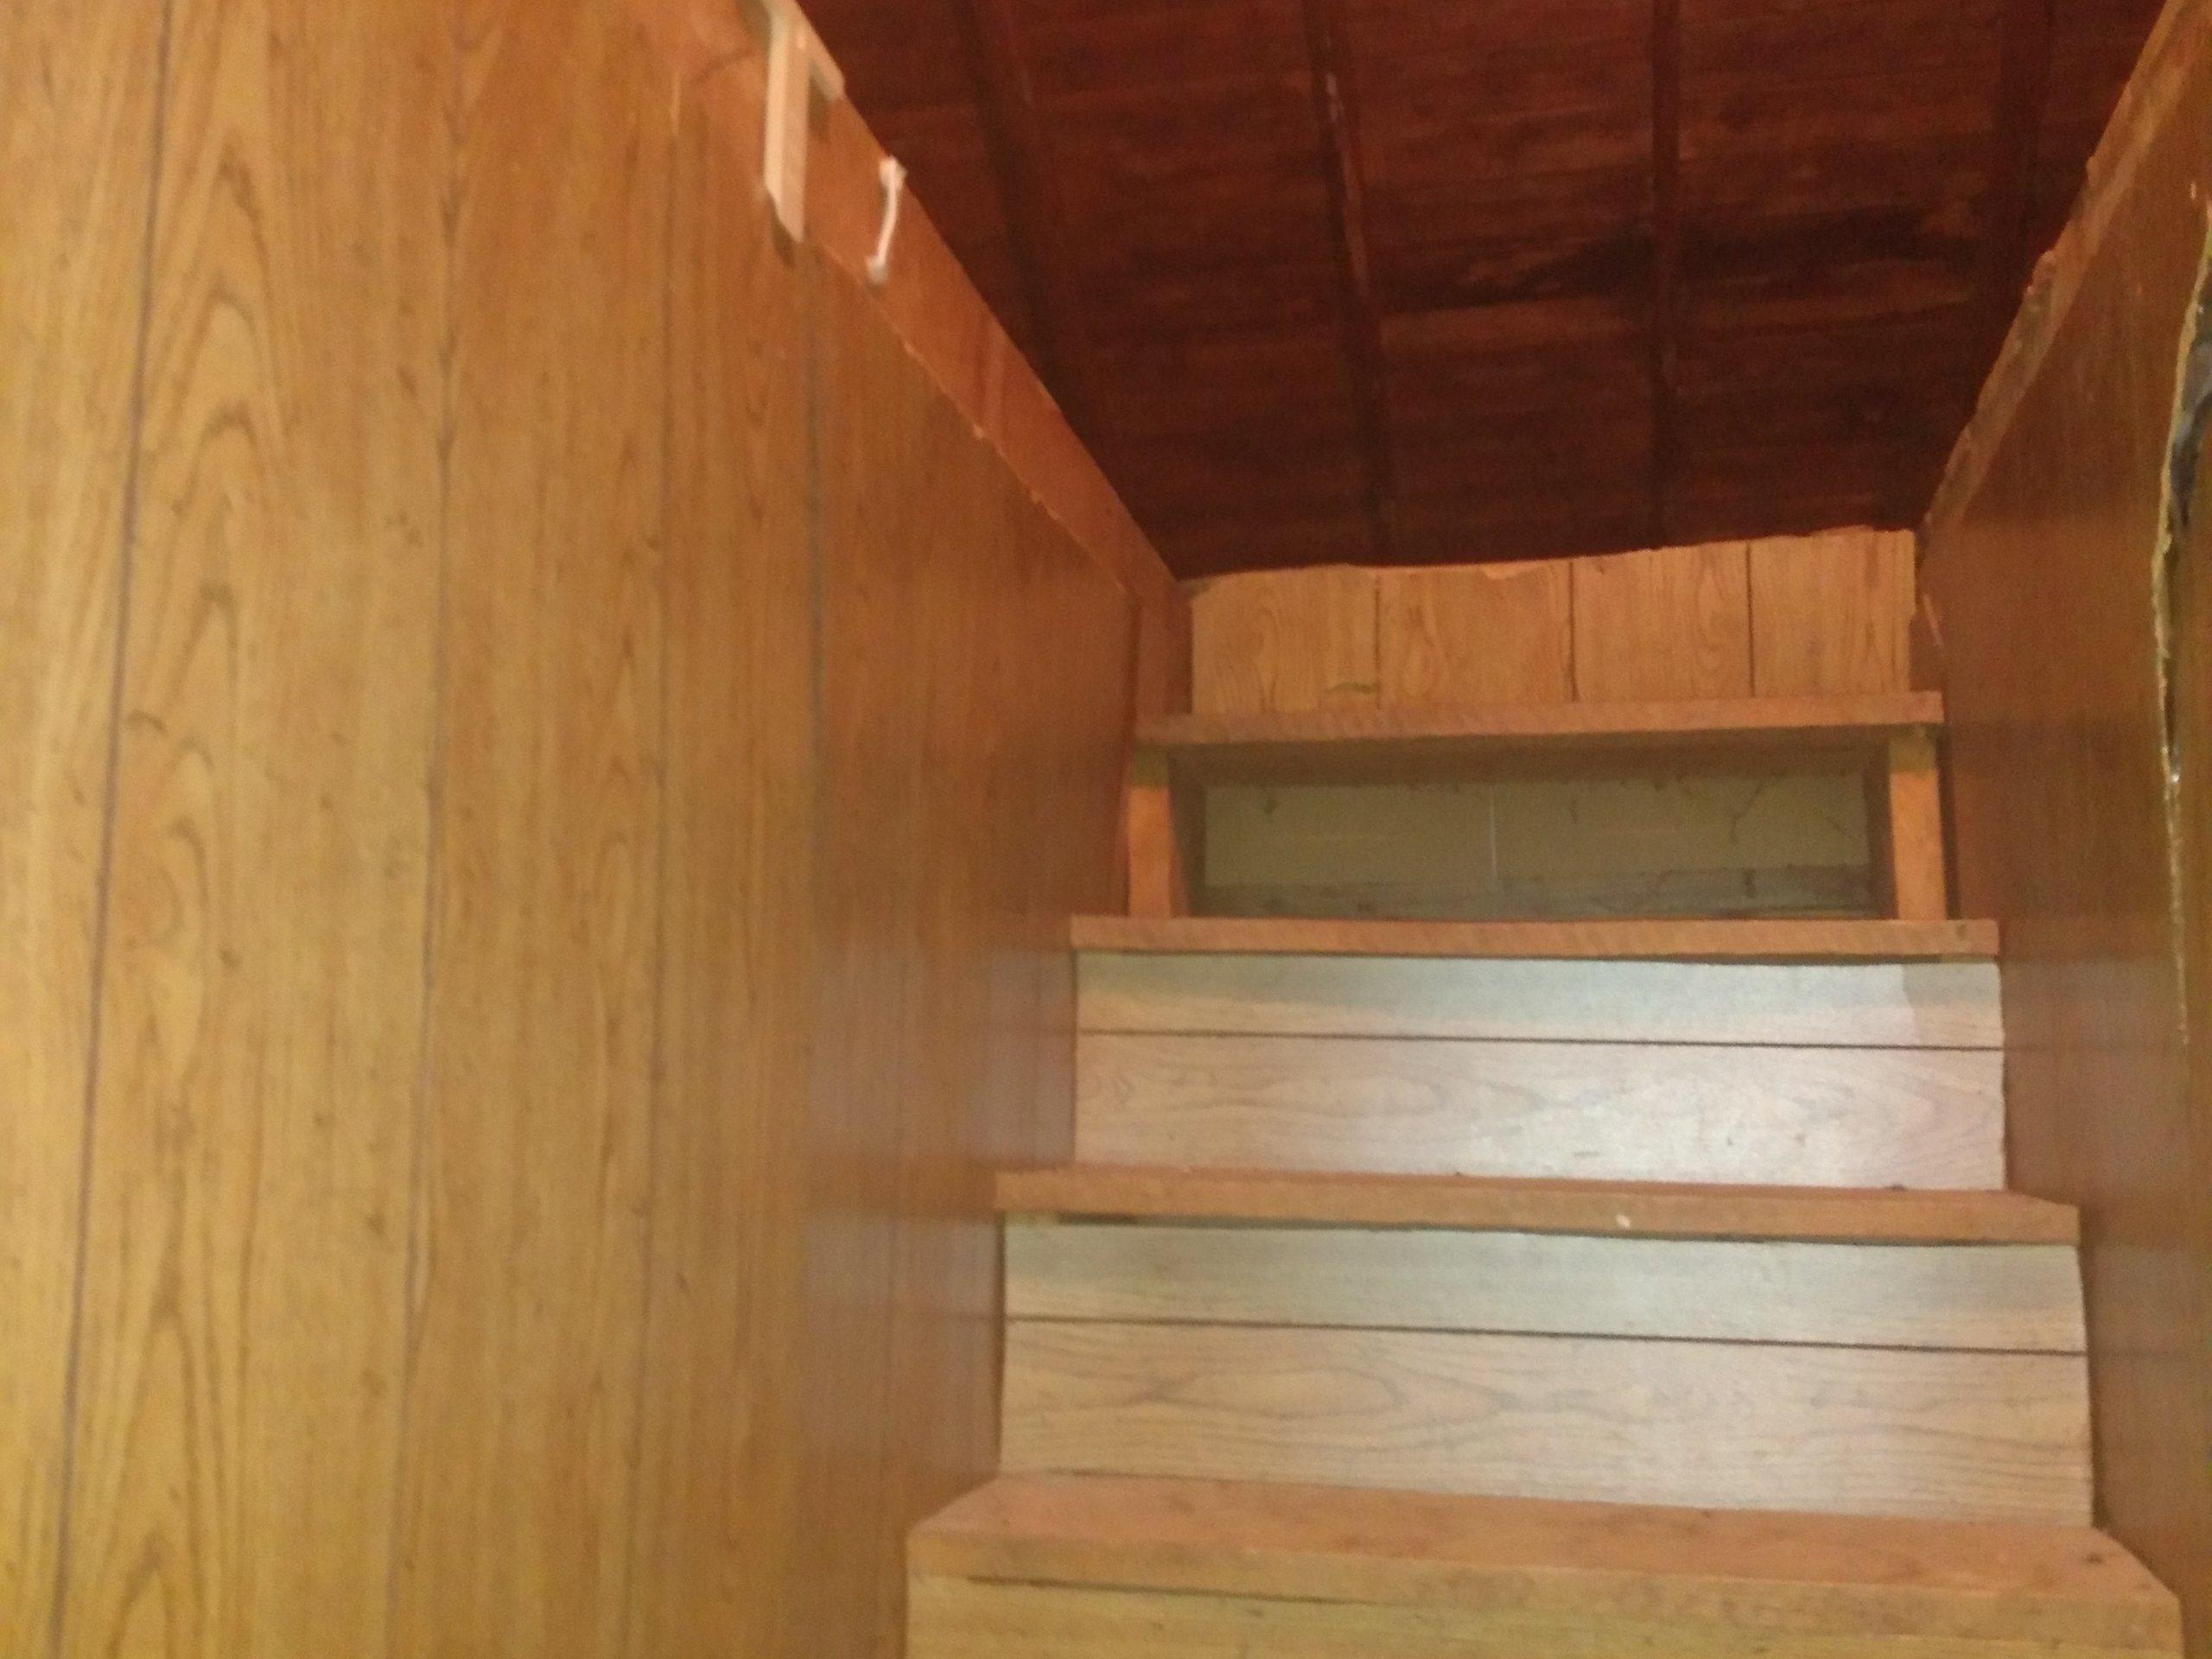 28x17 Attic self storage unit